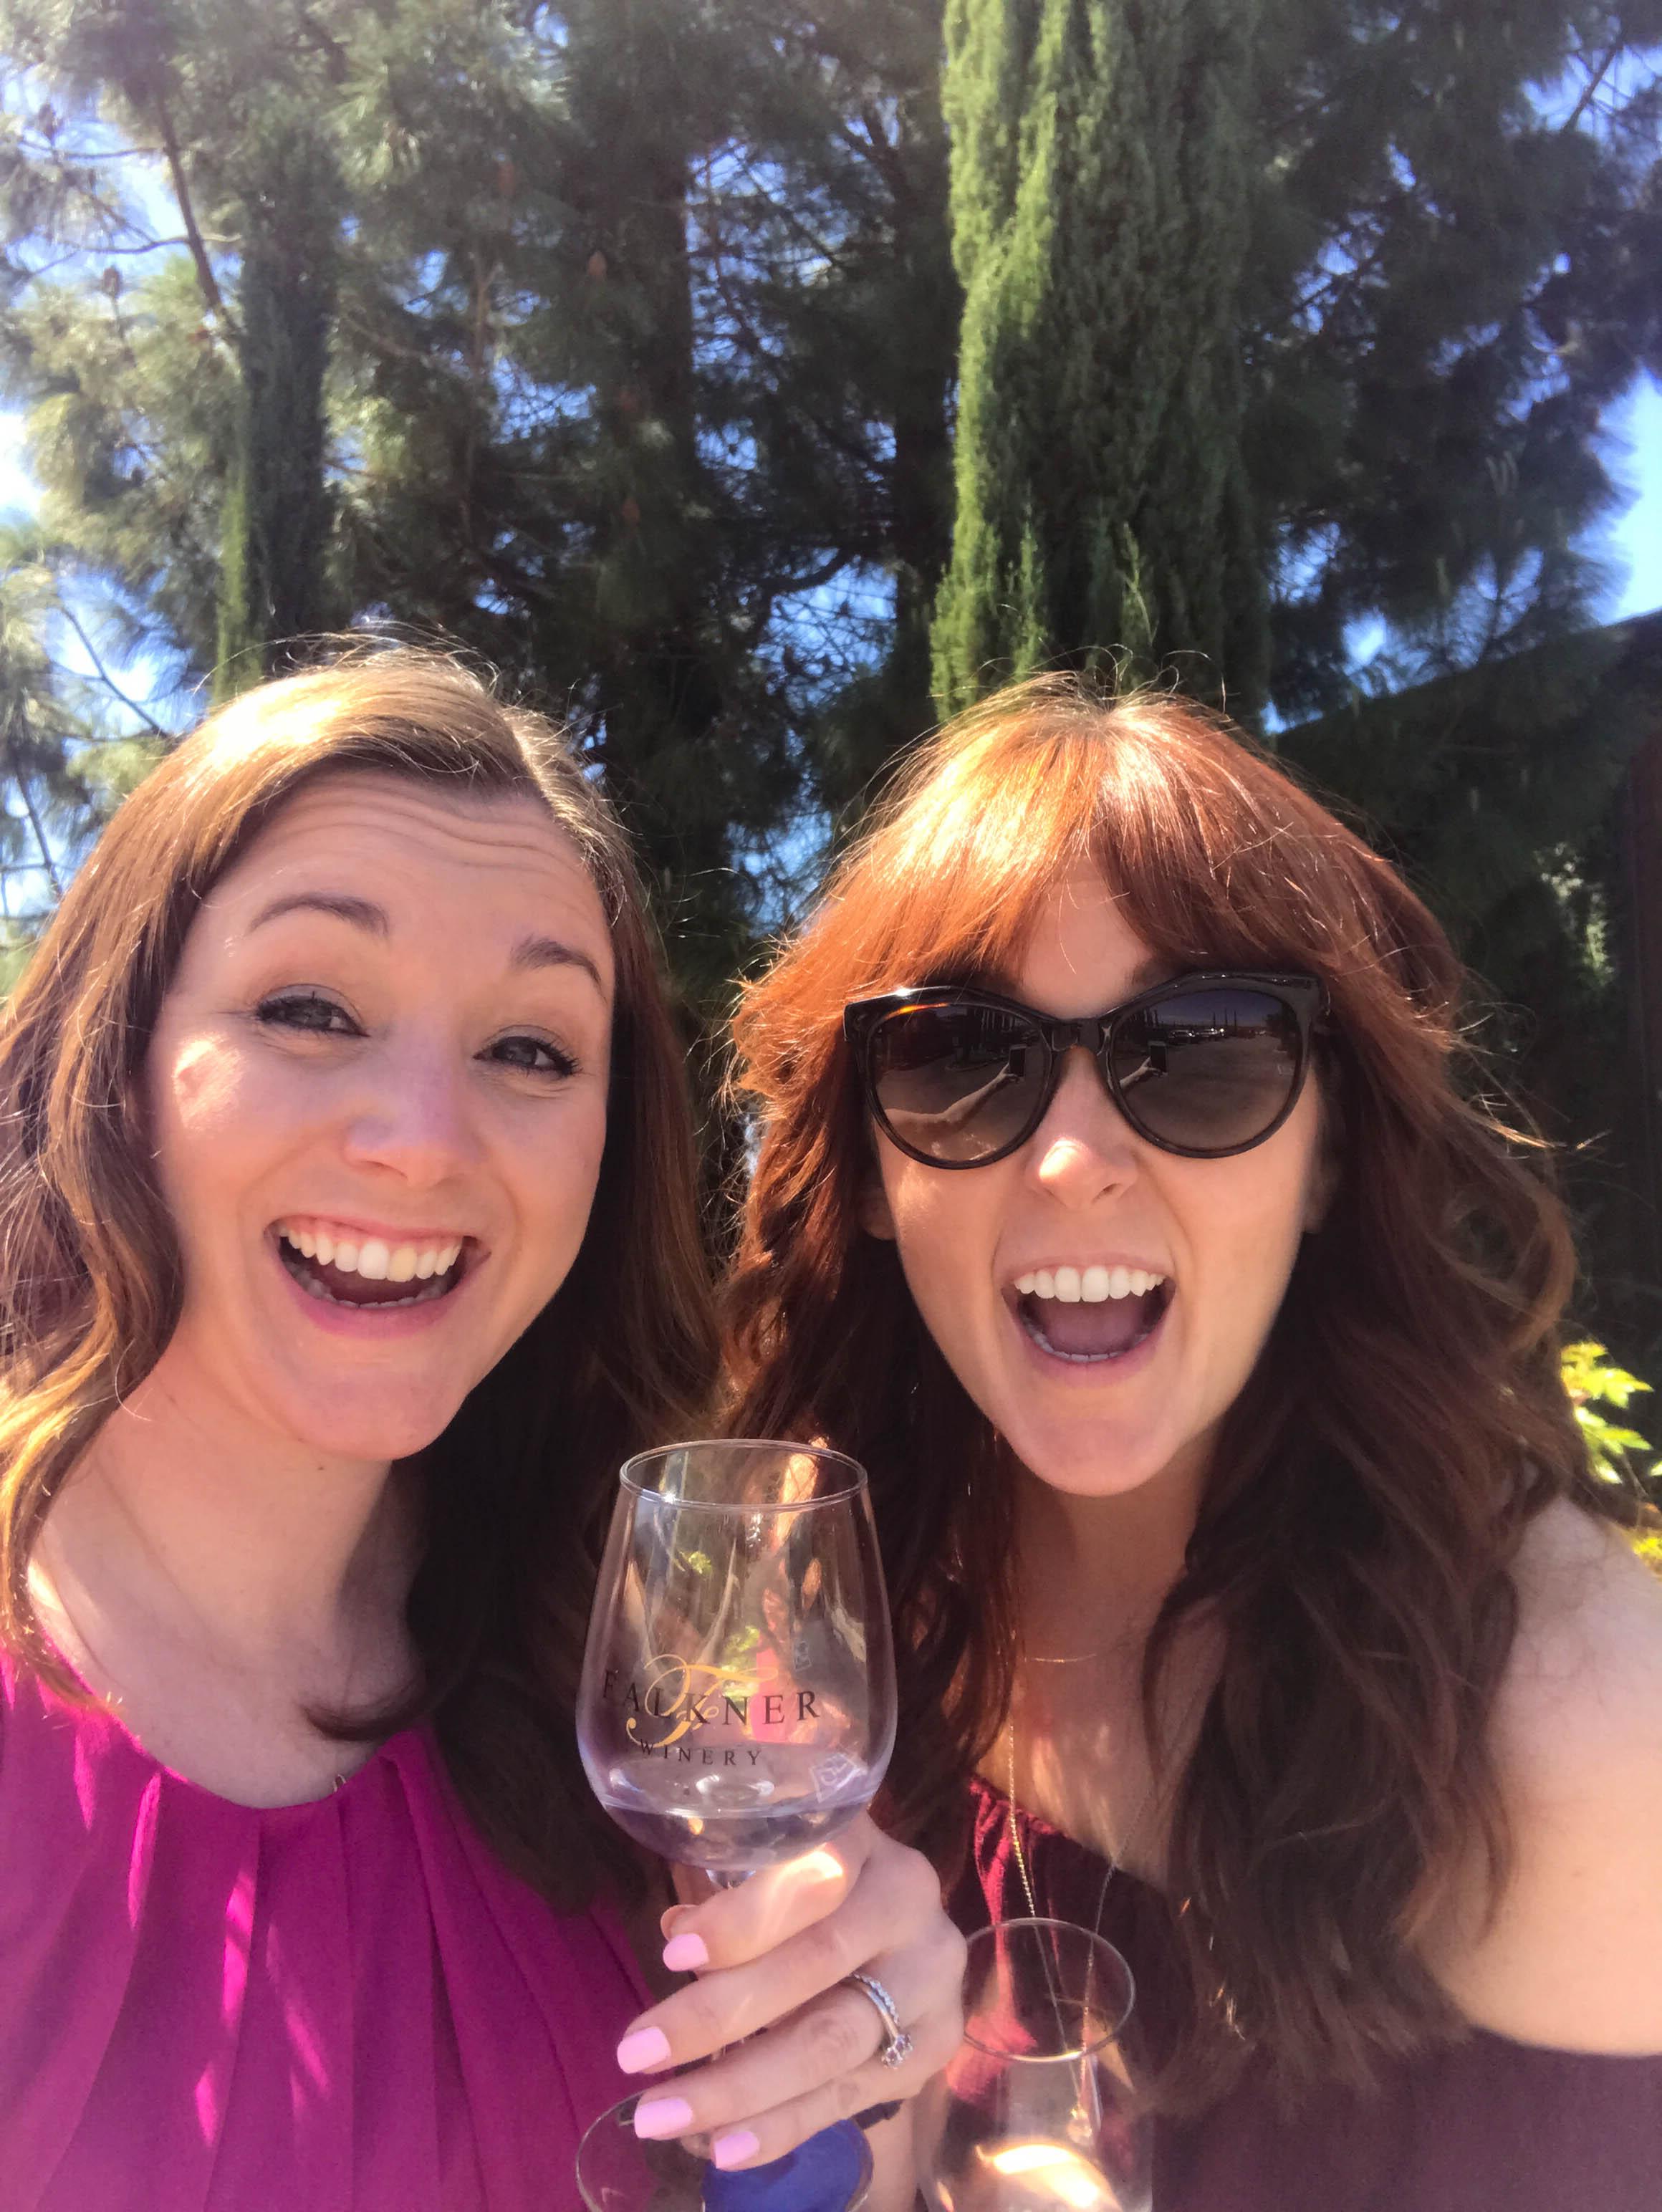 Temecula Wine Tasting Weekend Itinerary - Falkner Wine glasses